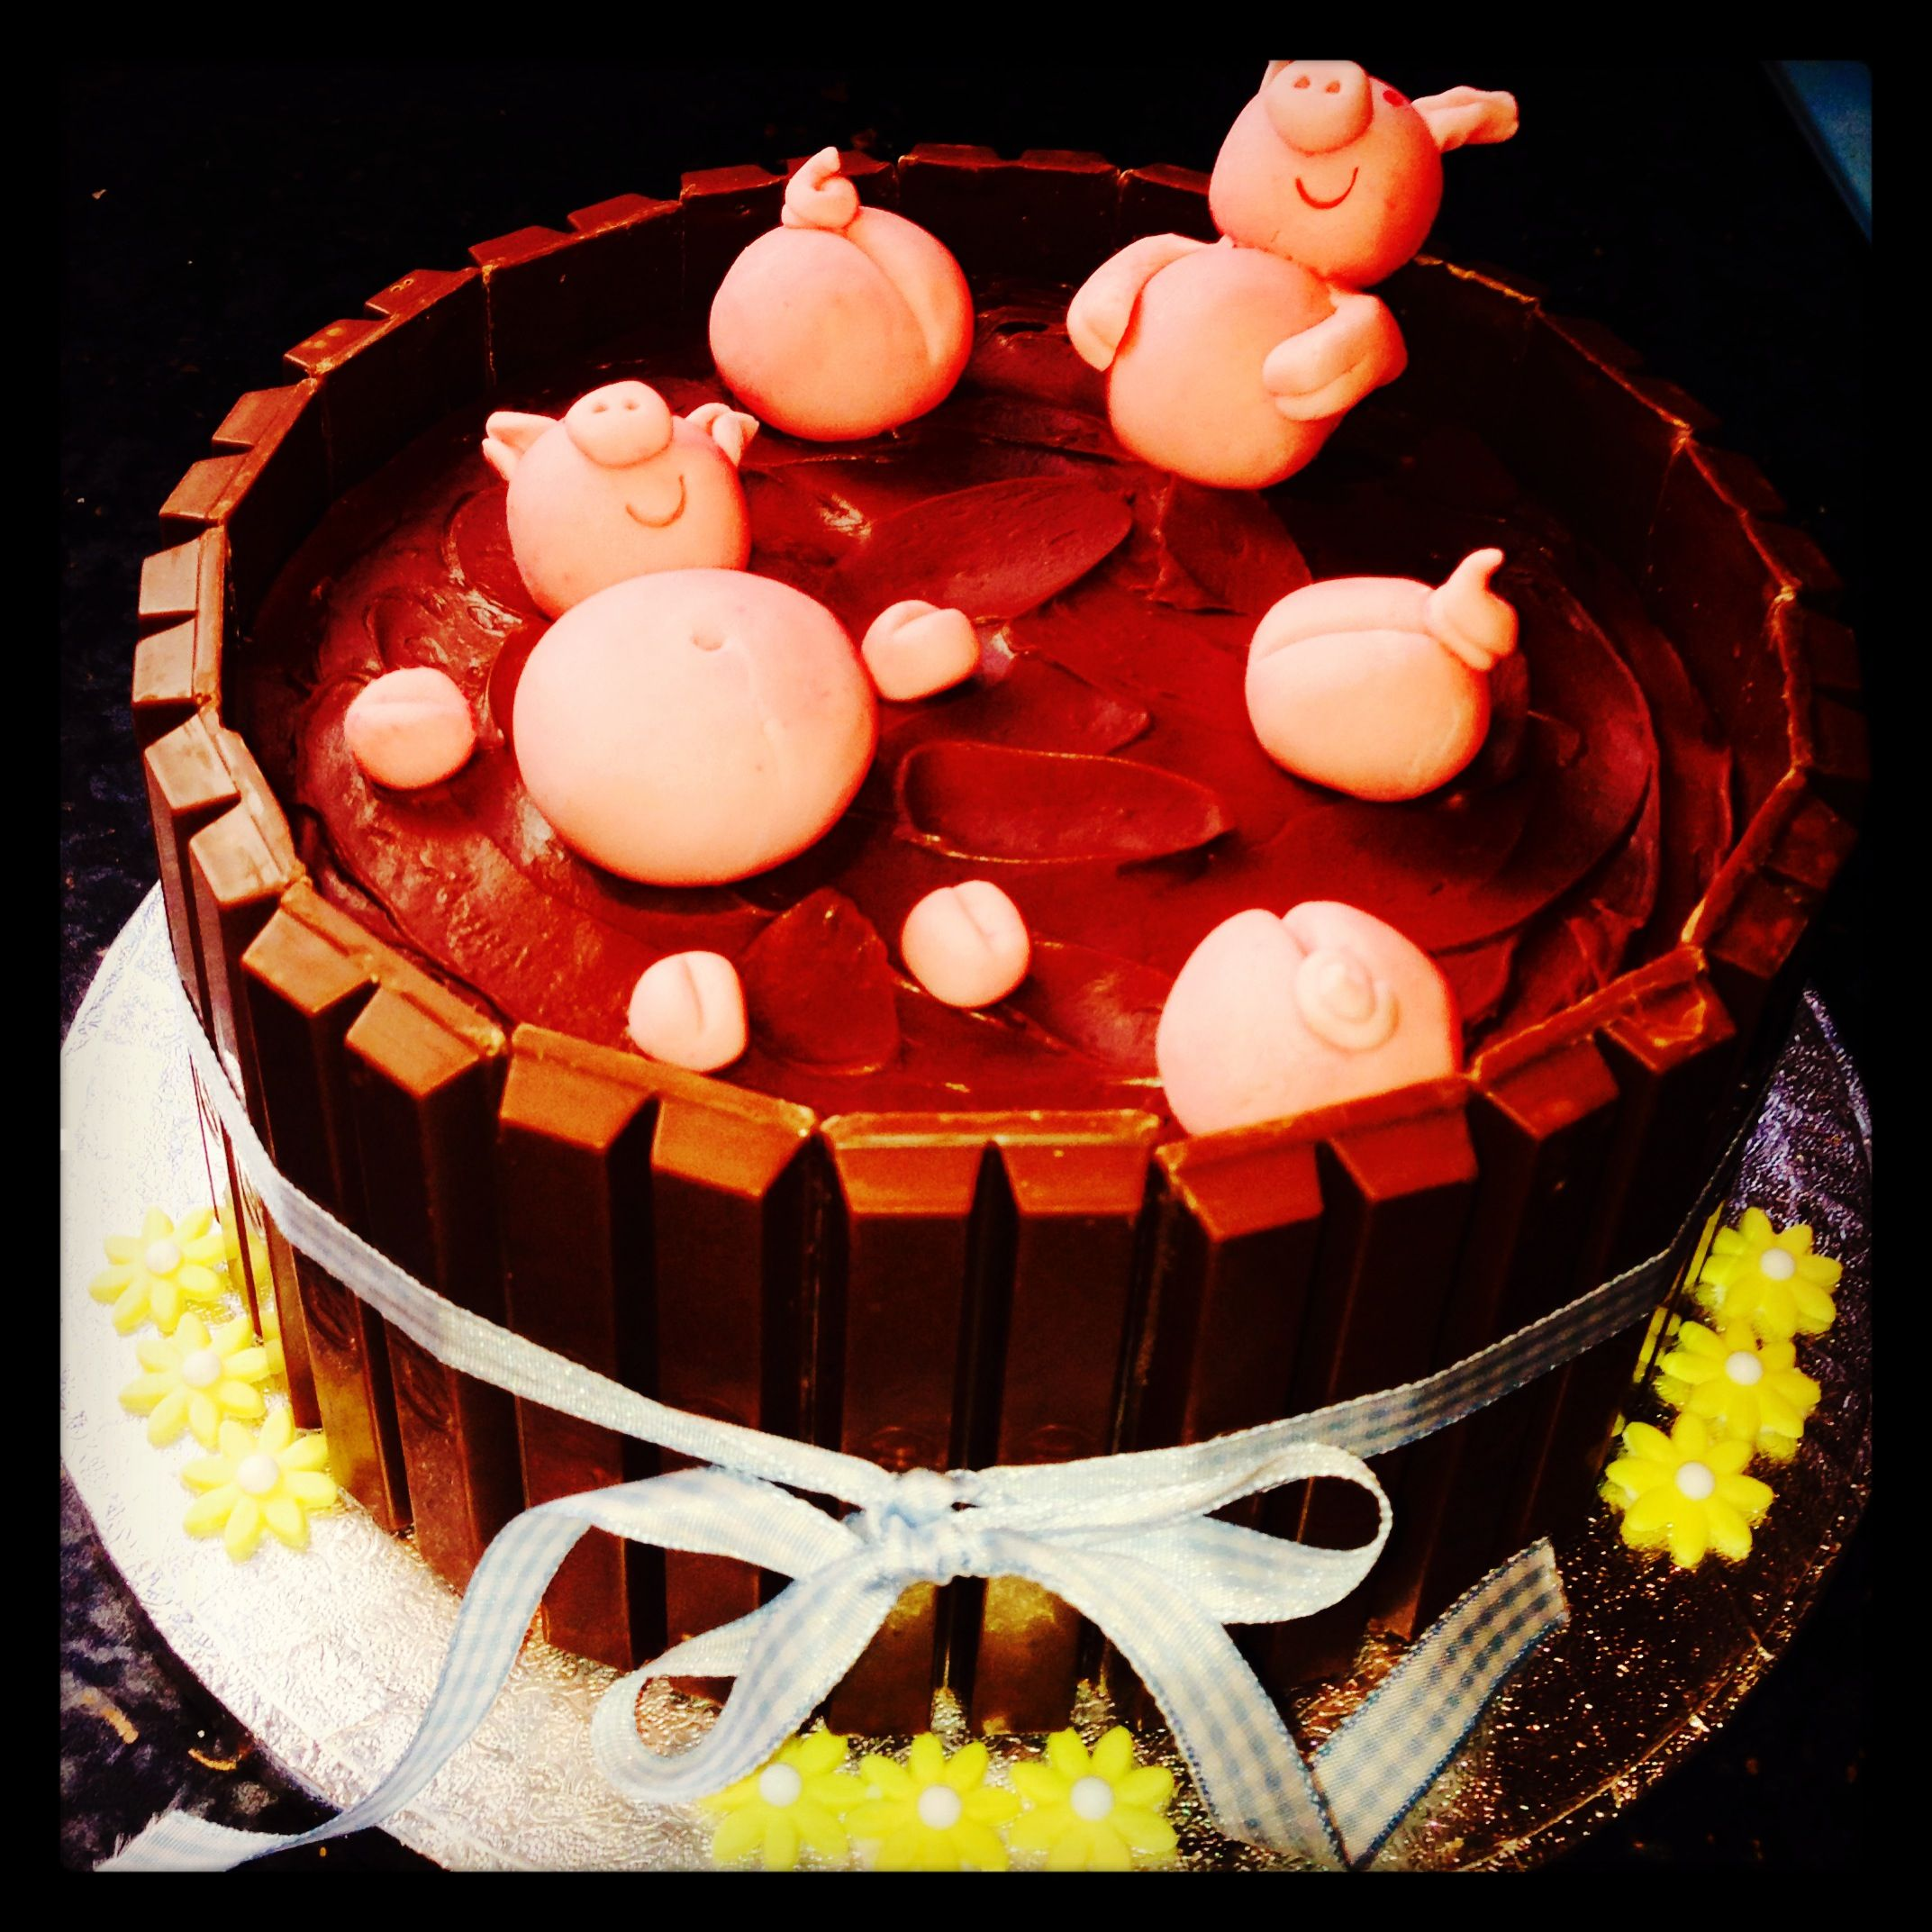 Pig mud bath cake | Cake decorating, Cake, Desserts